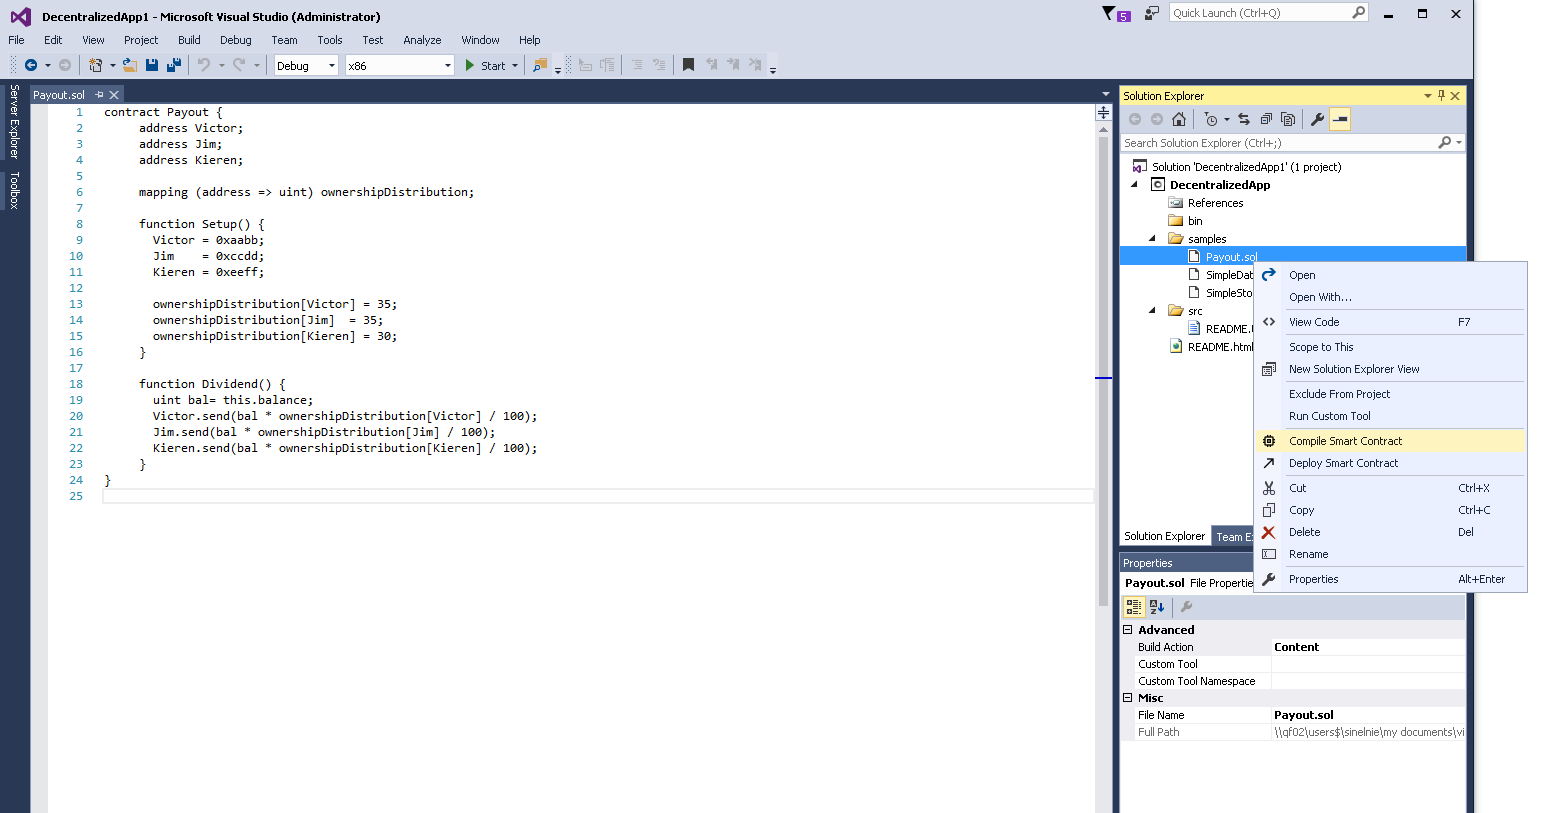 Decentralized applications development for .NET developers using Microsoft Visual Studio